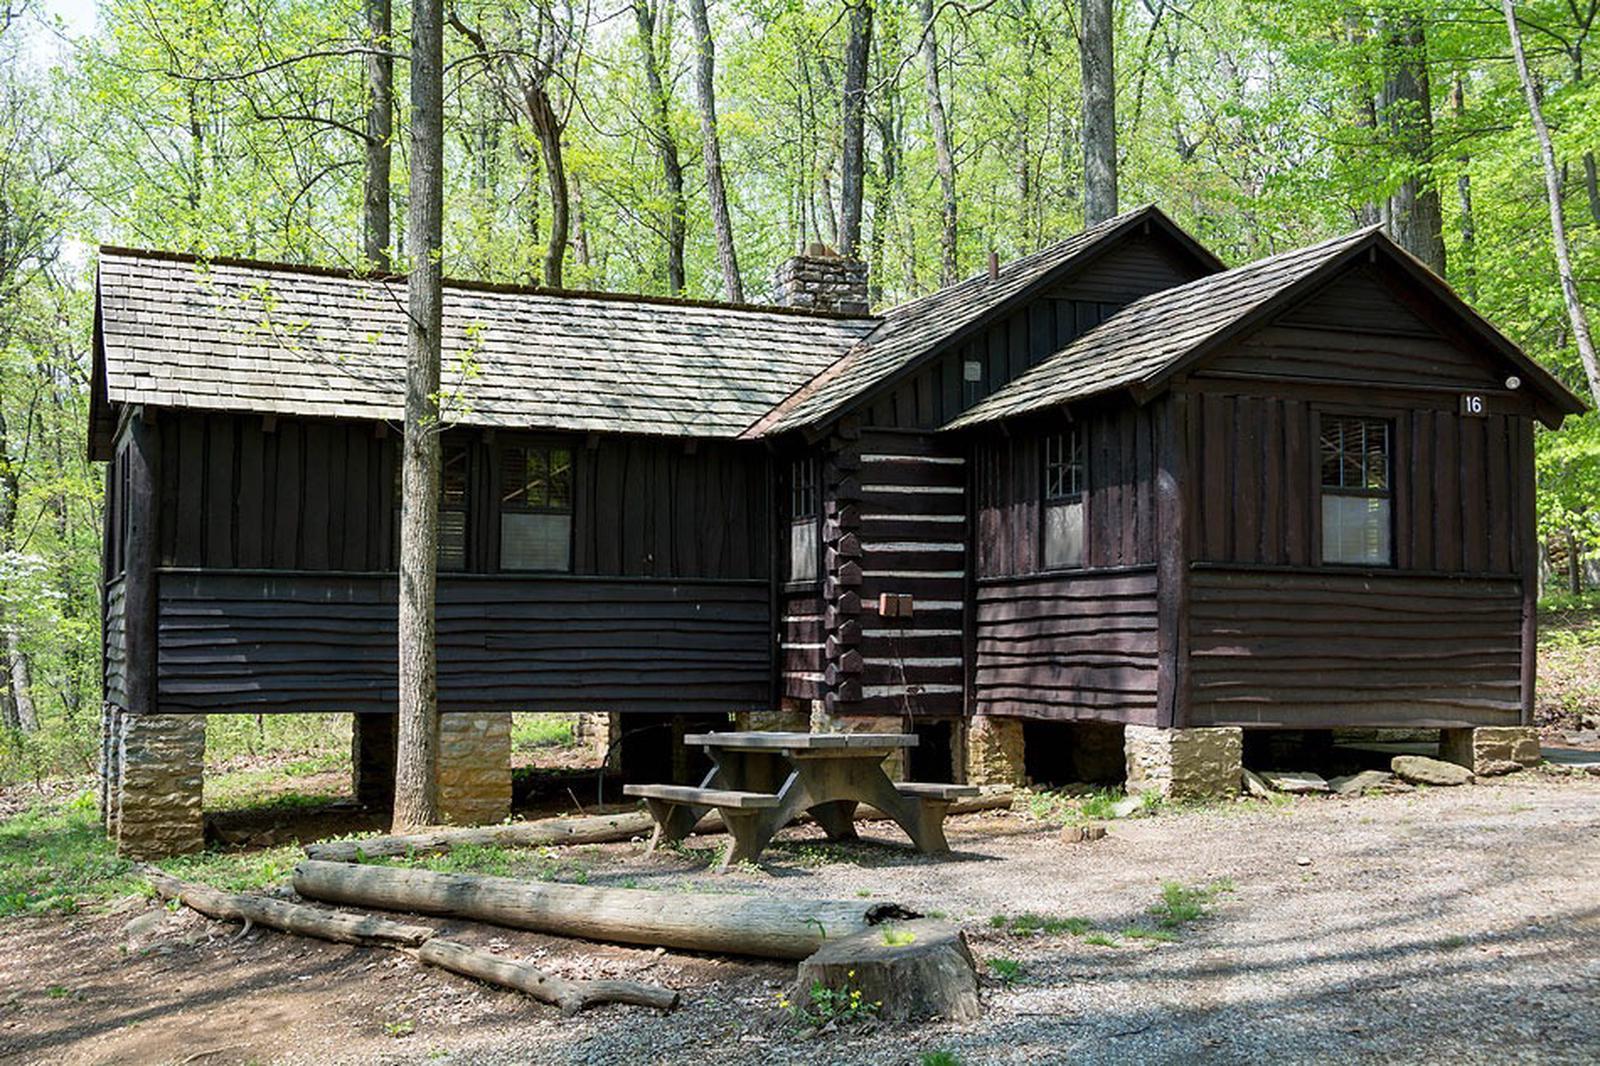 Camp Misty Mount Cabin 16